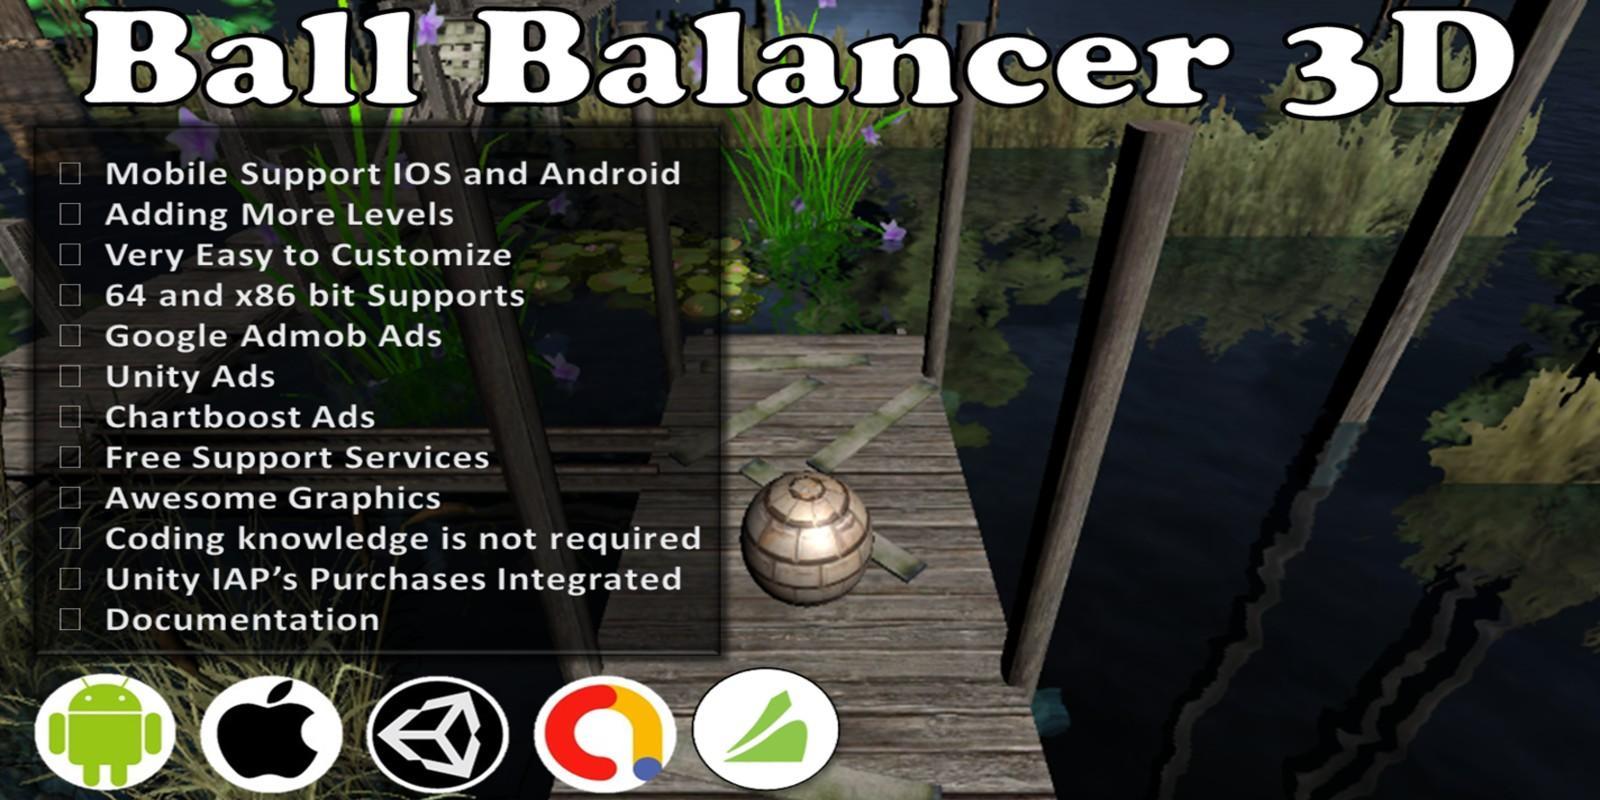 Ball Balancer 3D Unity Source Code